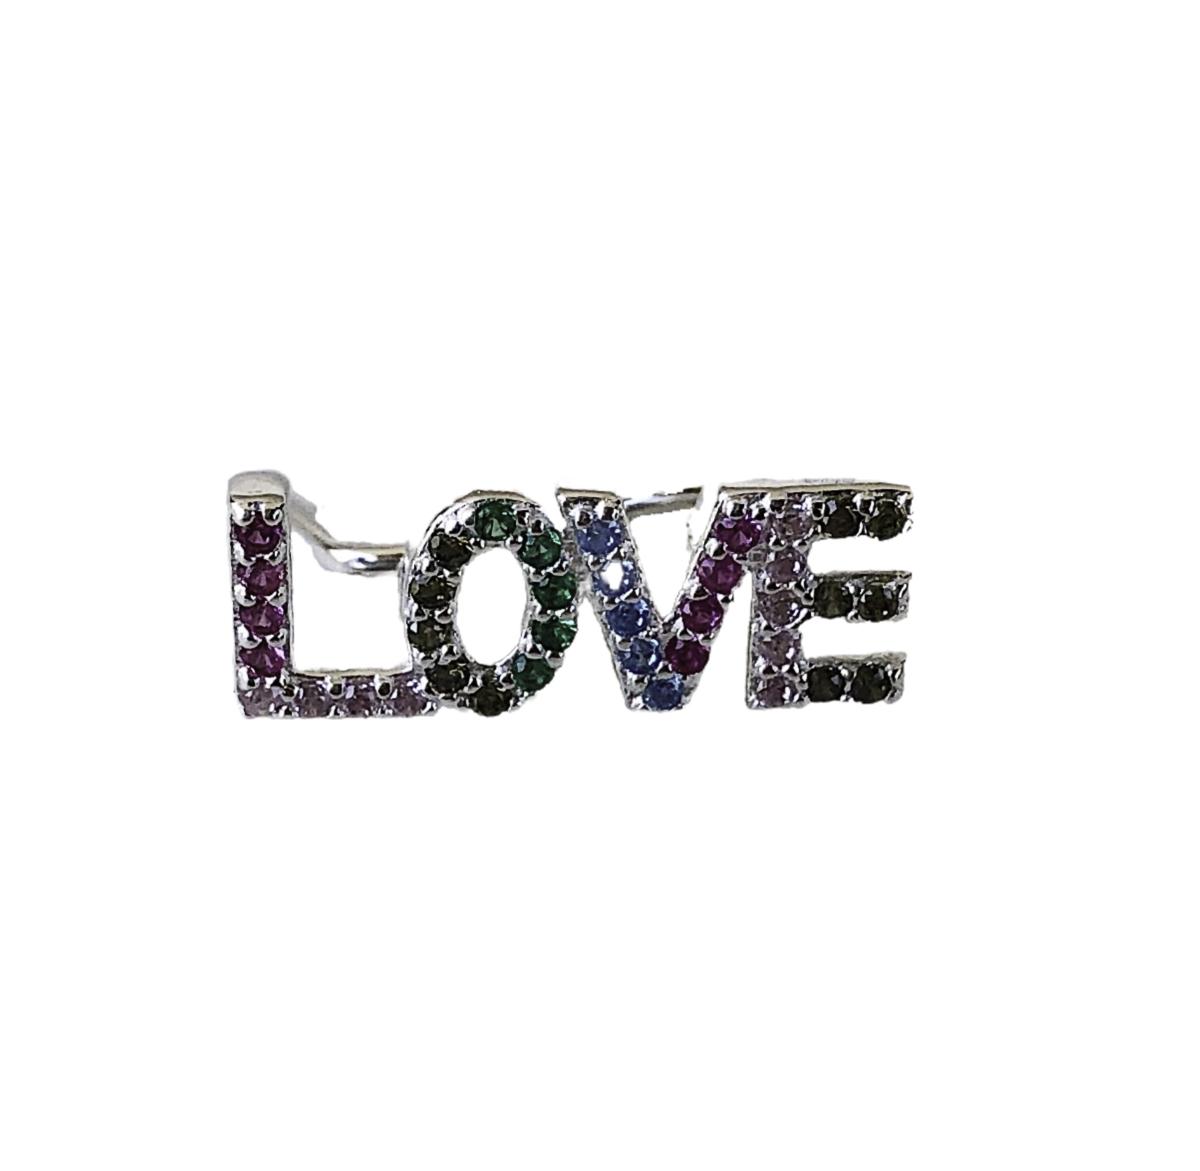 Piercing fake joia prata 925 pura Love cravejado colorido